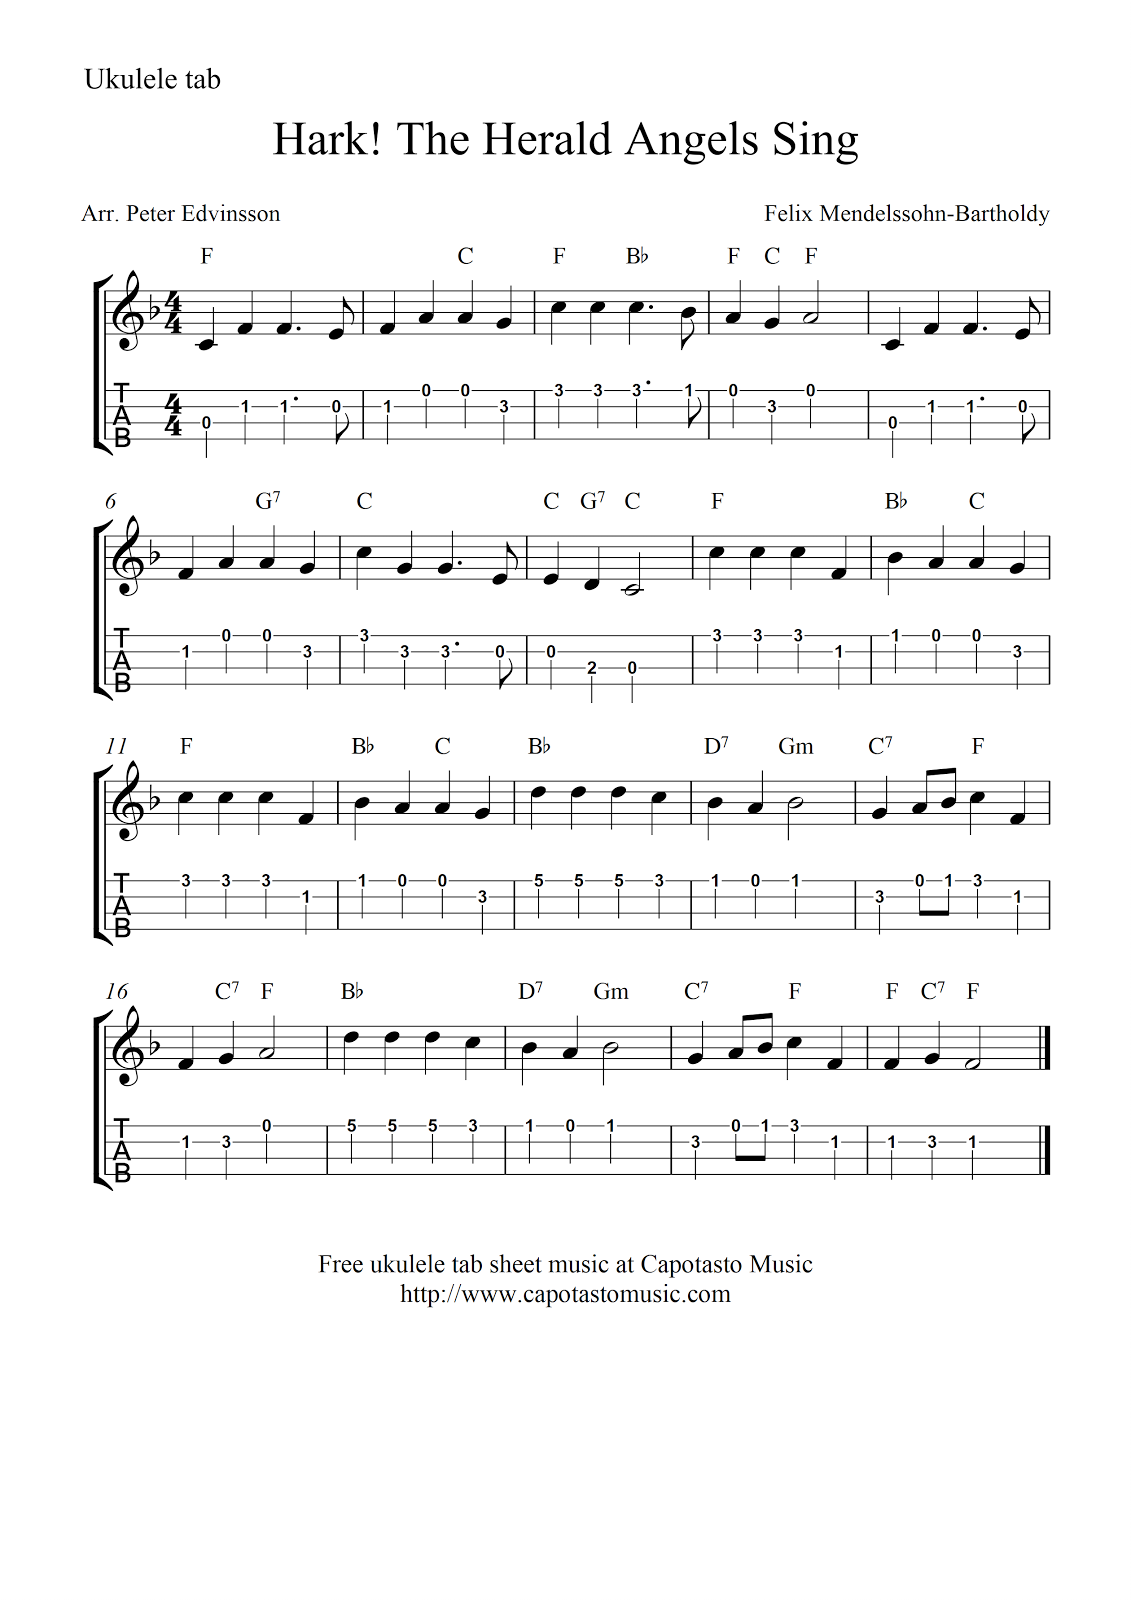 River chords by leon bridges worship chords guitar songs river chords by leon bridges worship chords guitar songs pinterest leon bridges worship chords and guitar songs hexwebz Gallery